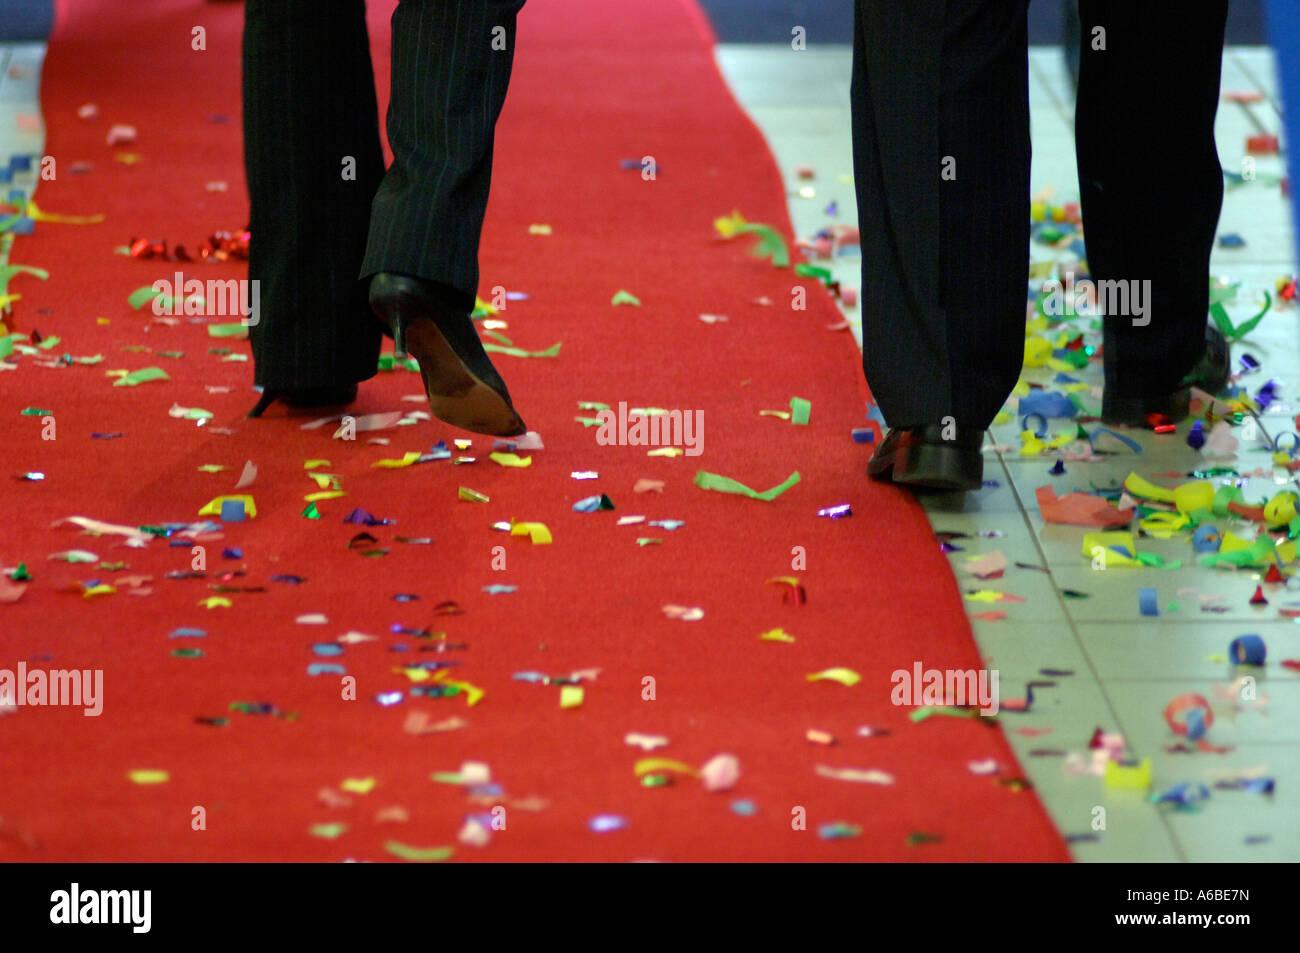 Business people walking on red carpet after celebration of opening London UK